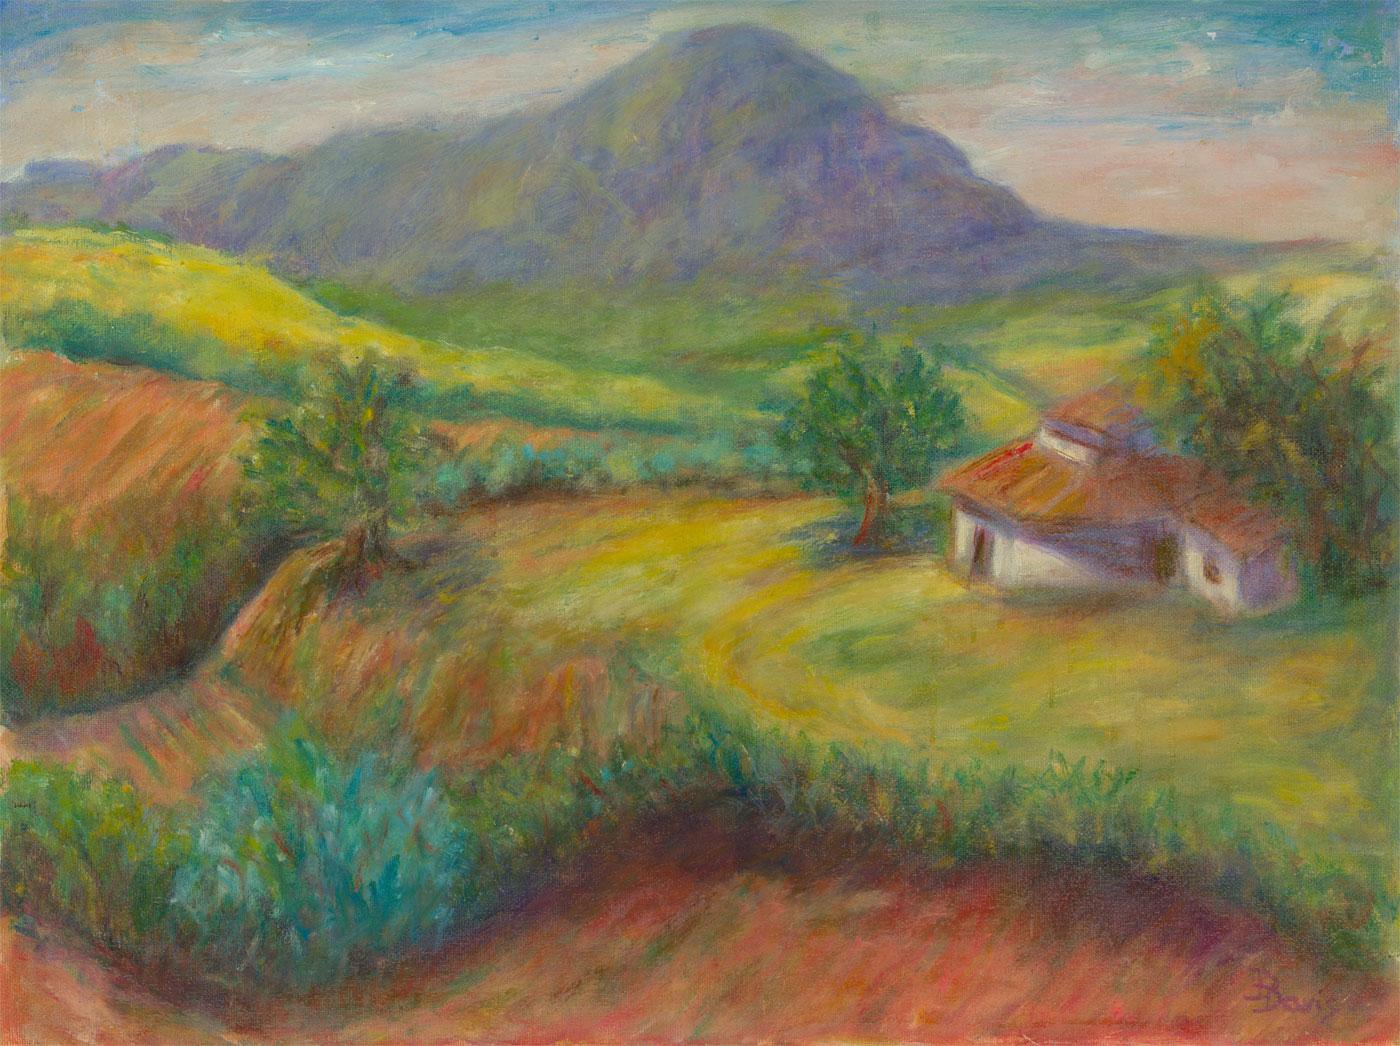 D.Davis - Signed Contemporary Oil, House in a Mountainous Landscape